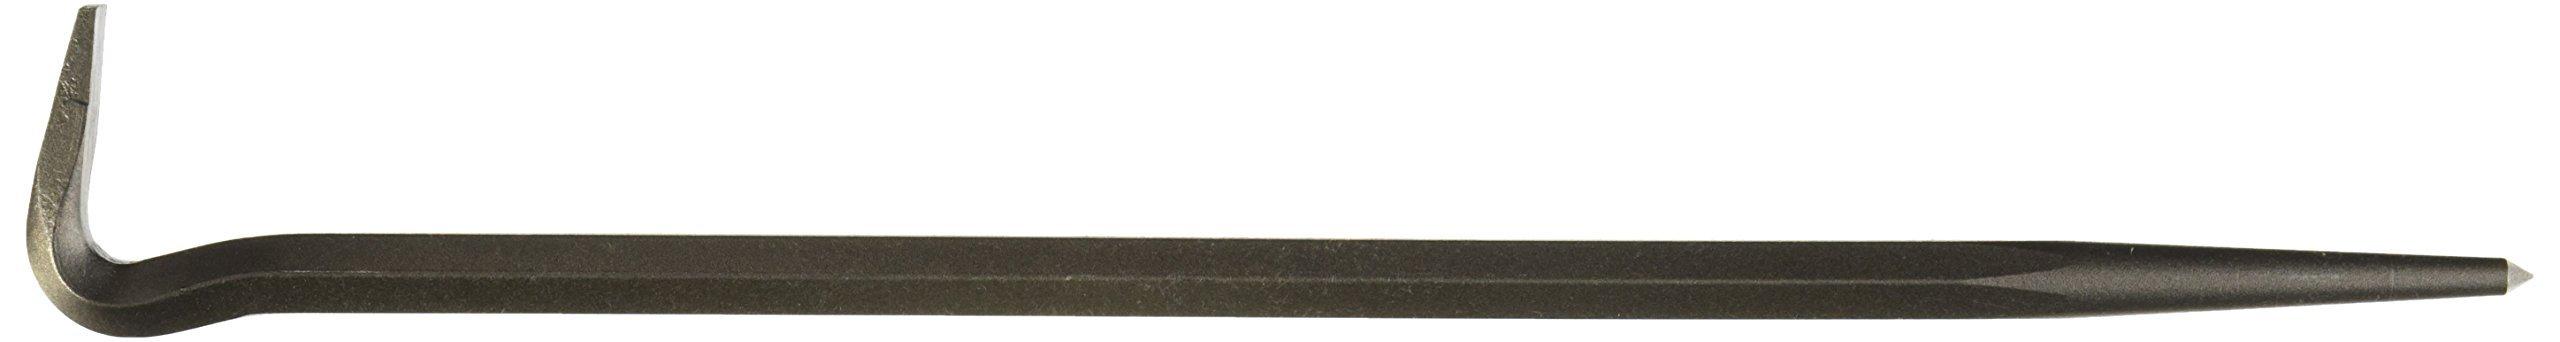 Mayhew Select 75101 16-Inch Rolling Head Pry Bar